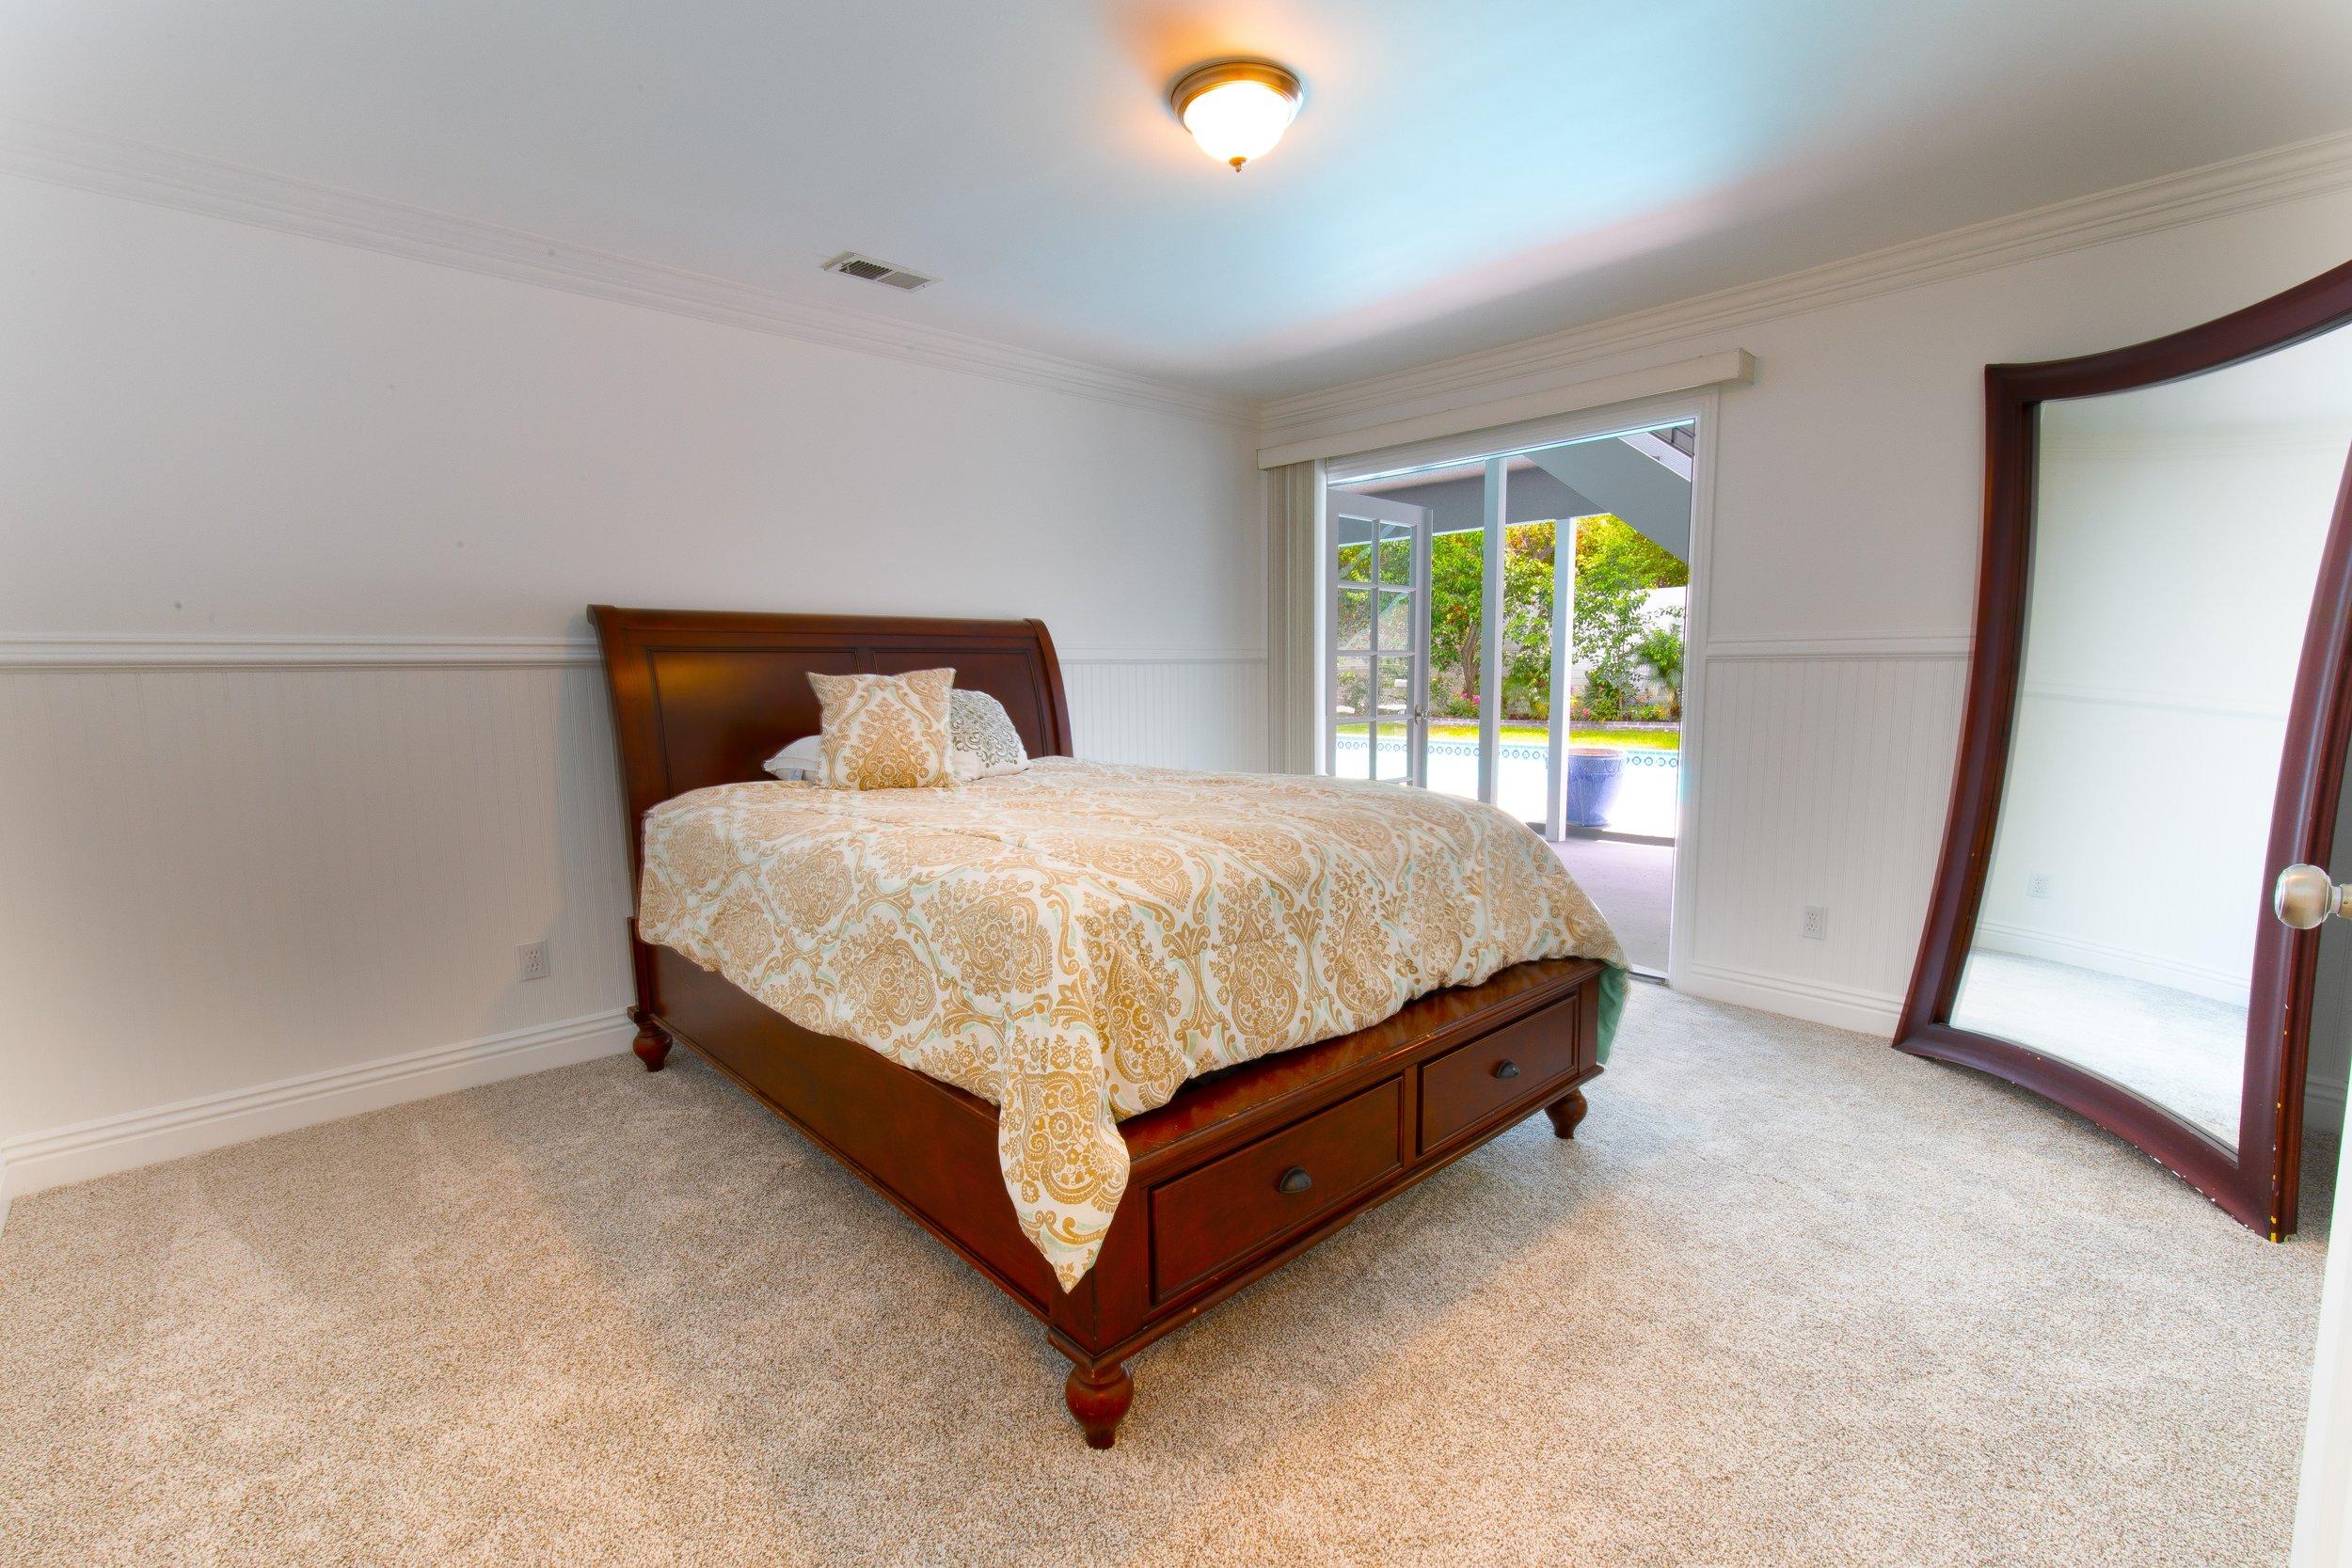 MLS Bedroom 3-2.jpg